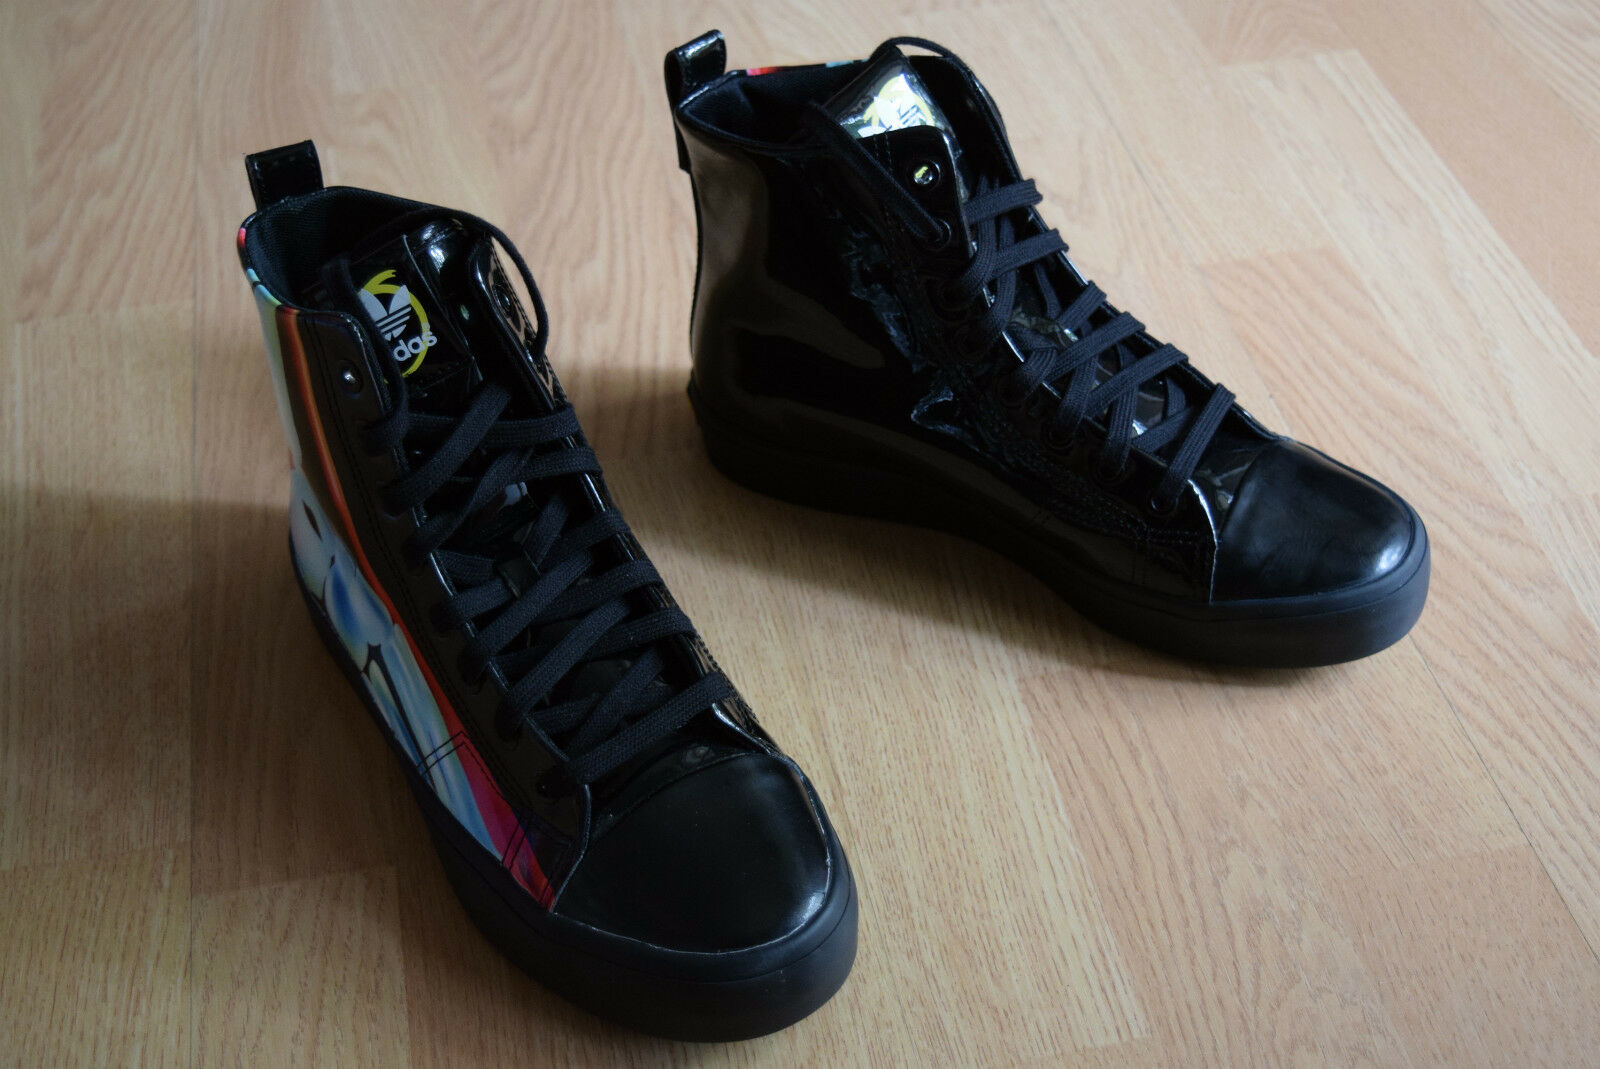 Adidas 39 Honey 2.0 W 38 39 Adidas 40 40,5 41 42 Rita Ora B26717 superstar nizza top ten 23c290